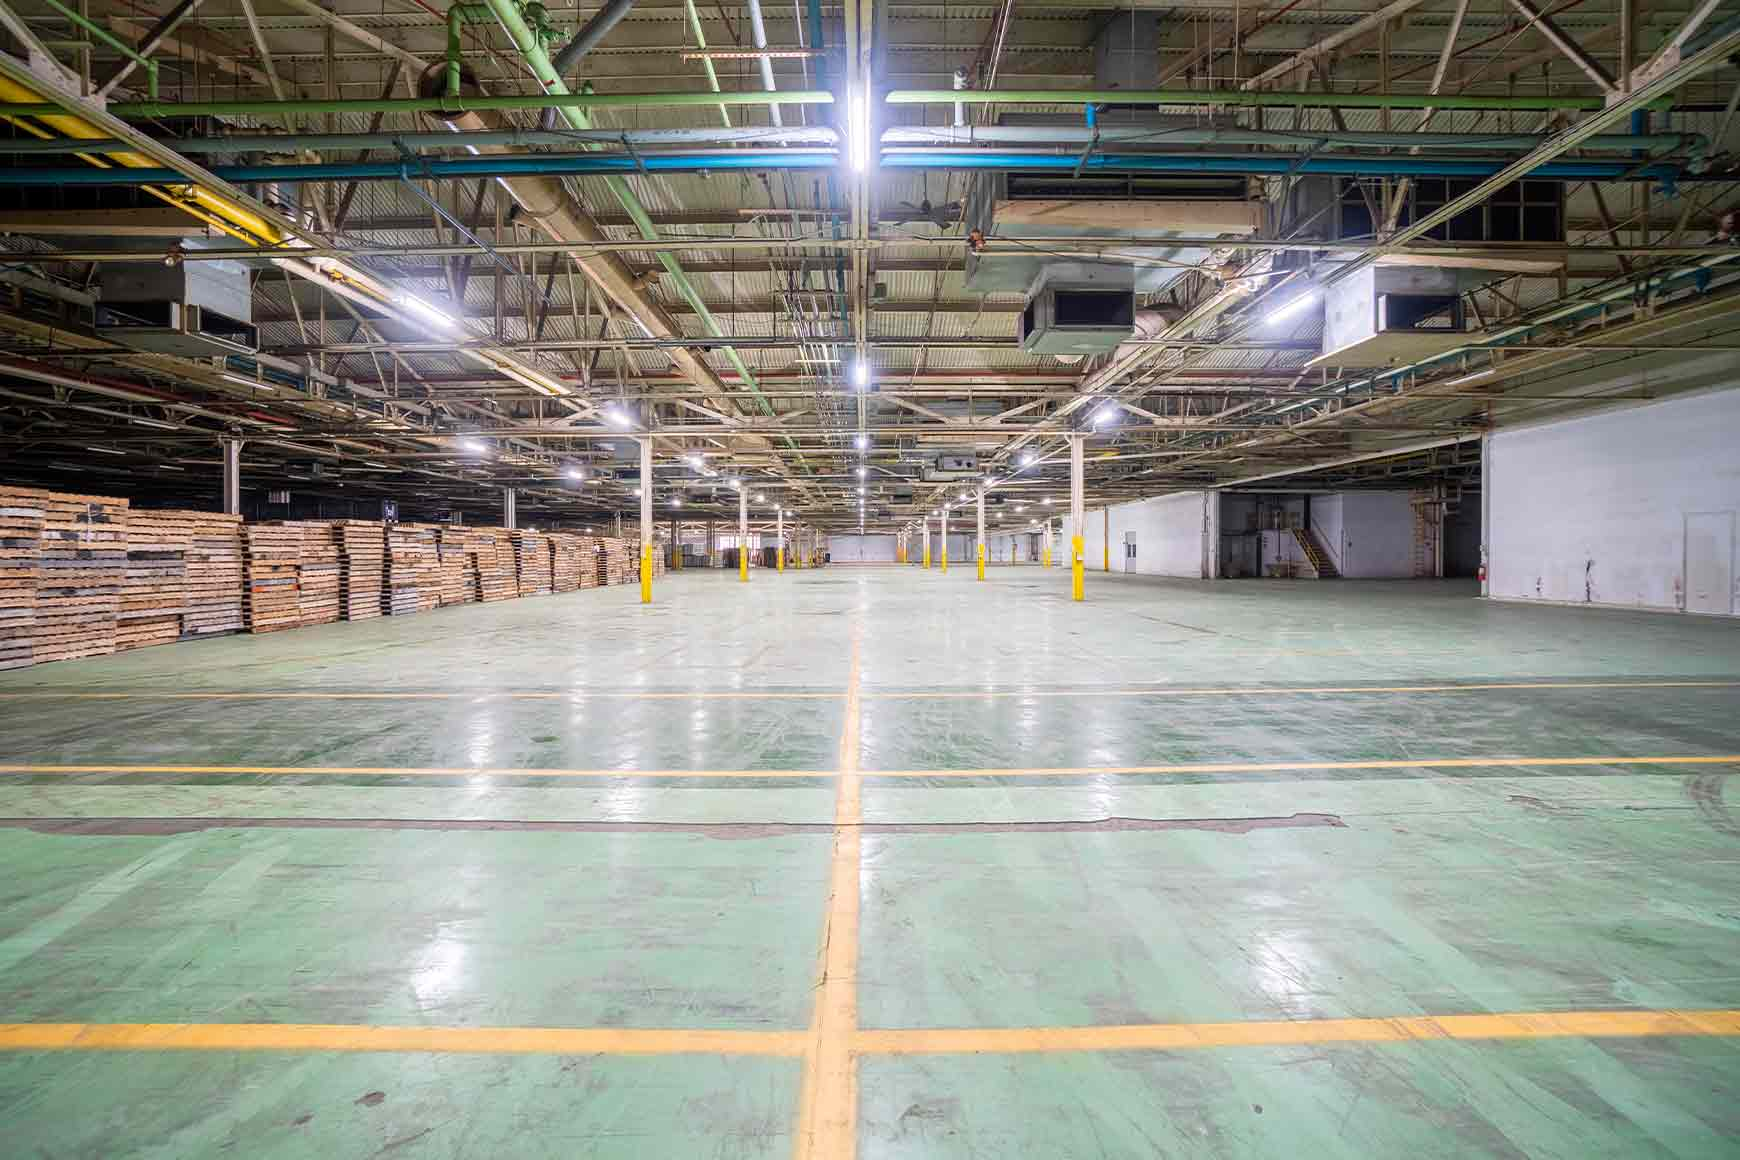 625 - 706 S Side Drive | Phoenix Investors